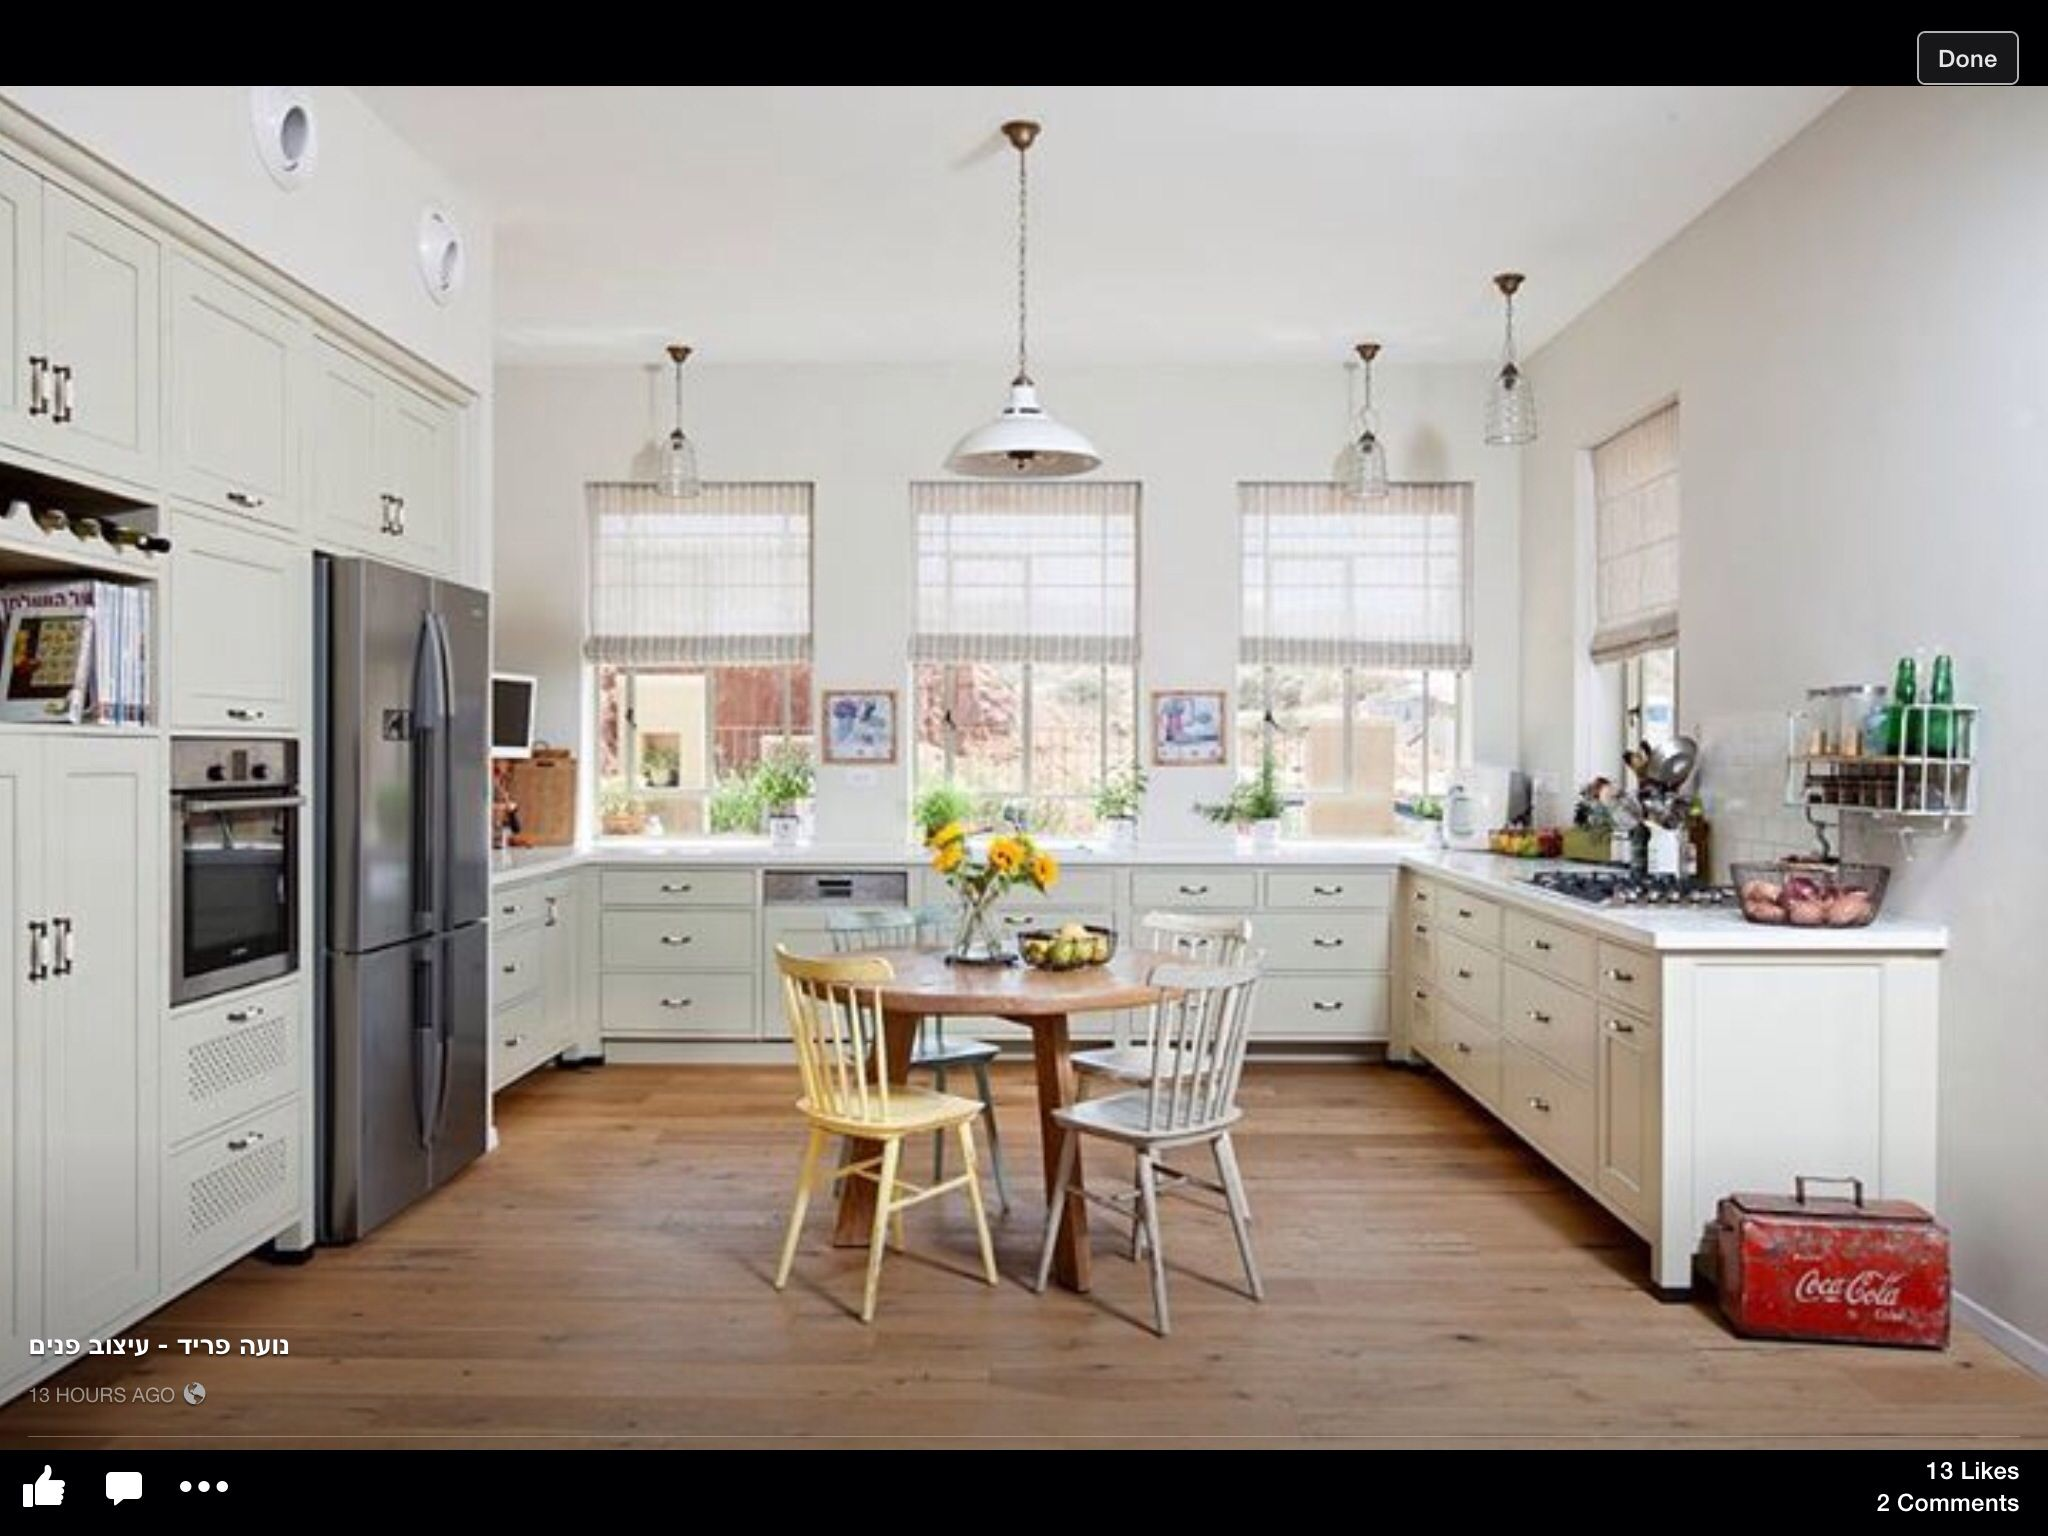 נועה פריד | Houses I love | Pinterest